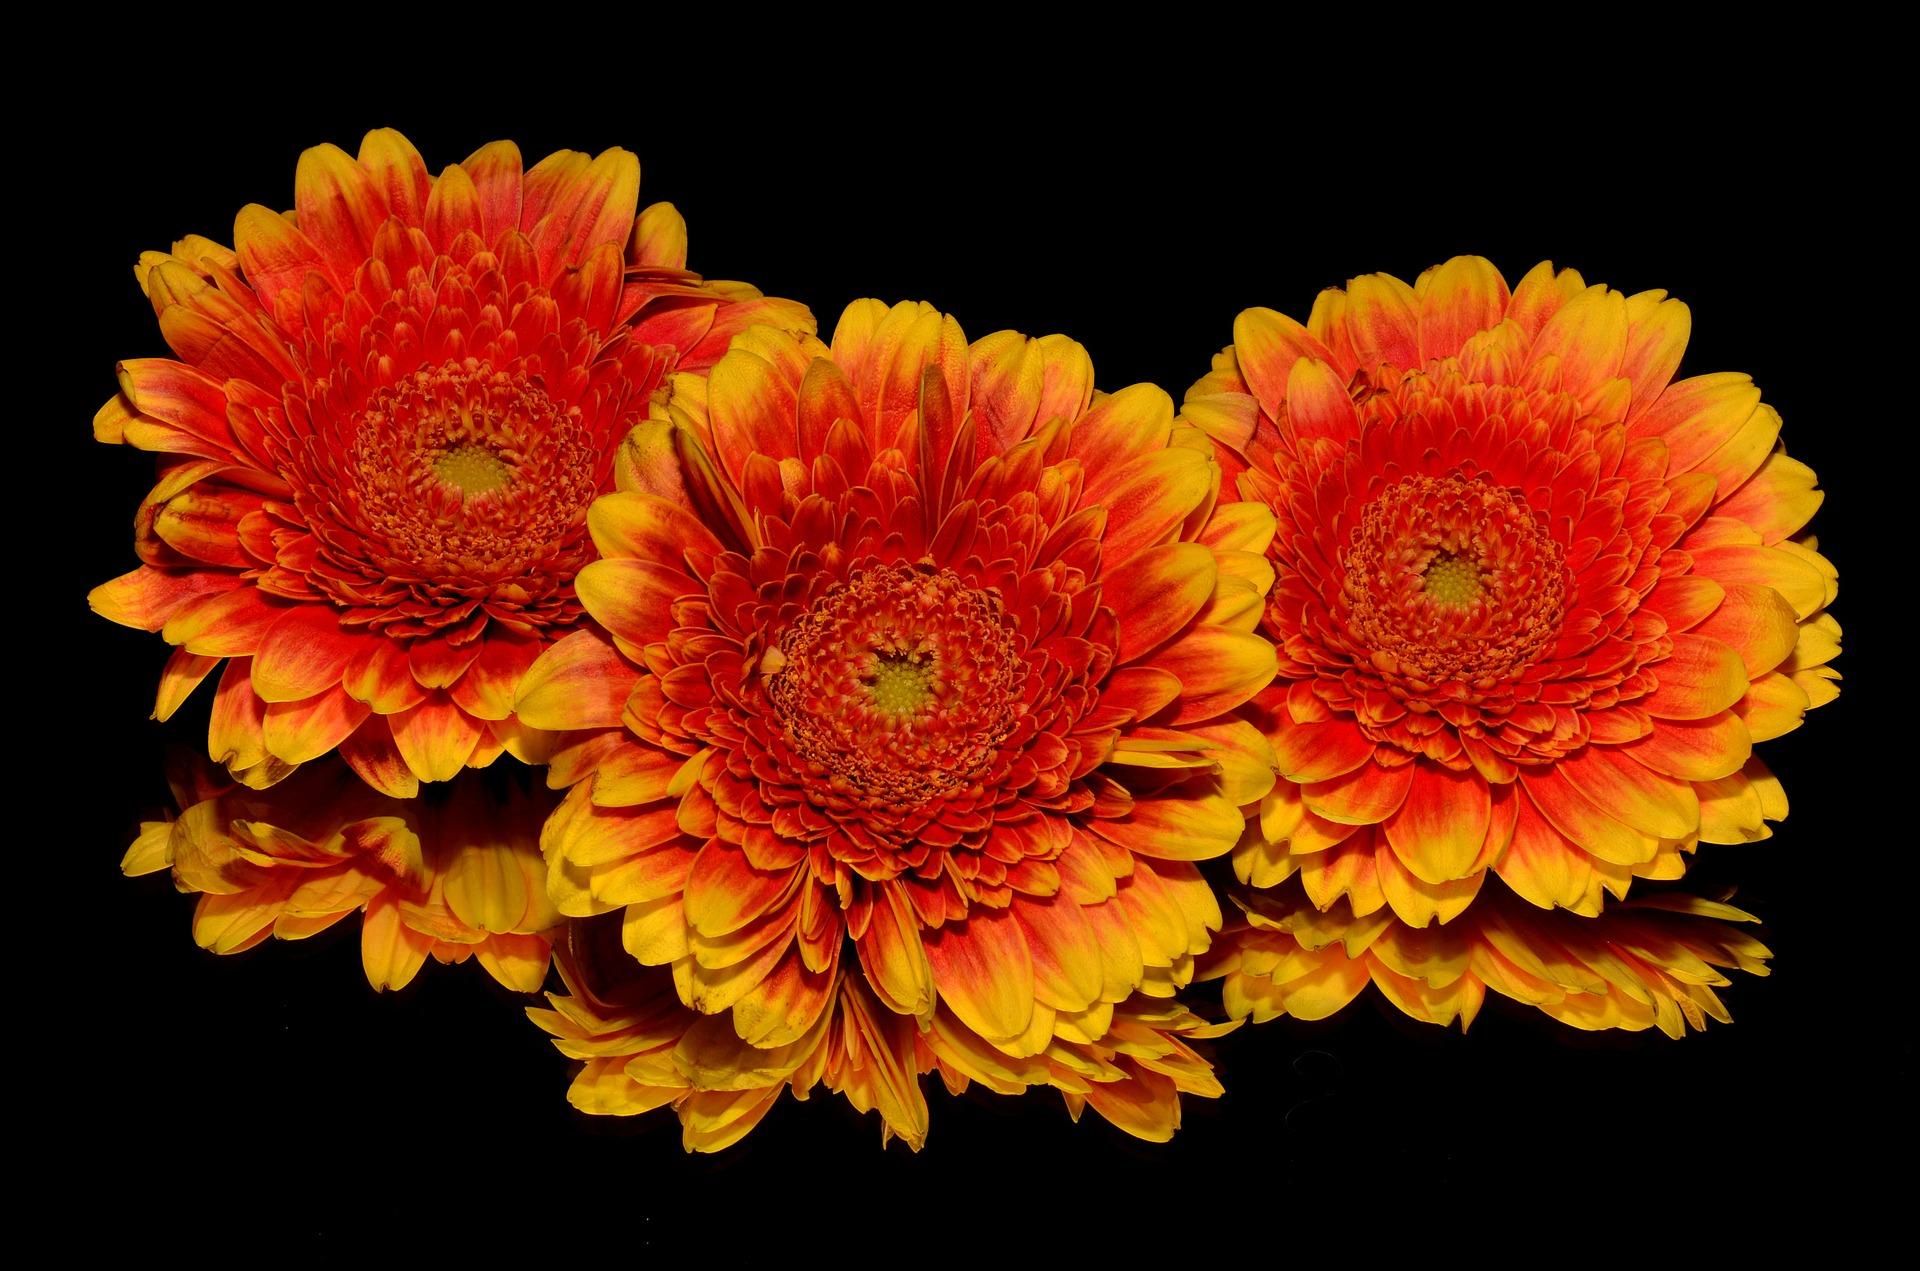 flori - sfatulparintilor.ro - pixabay_com